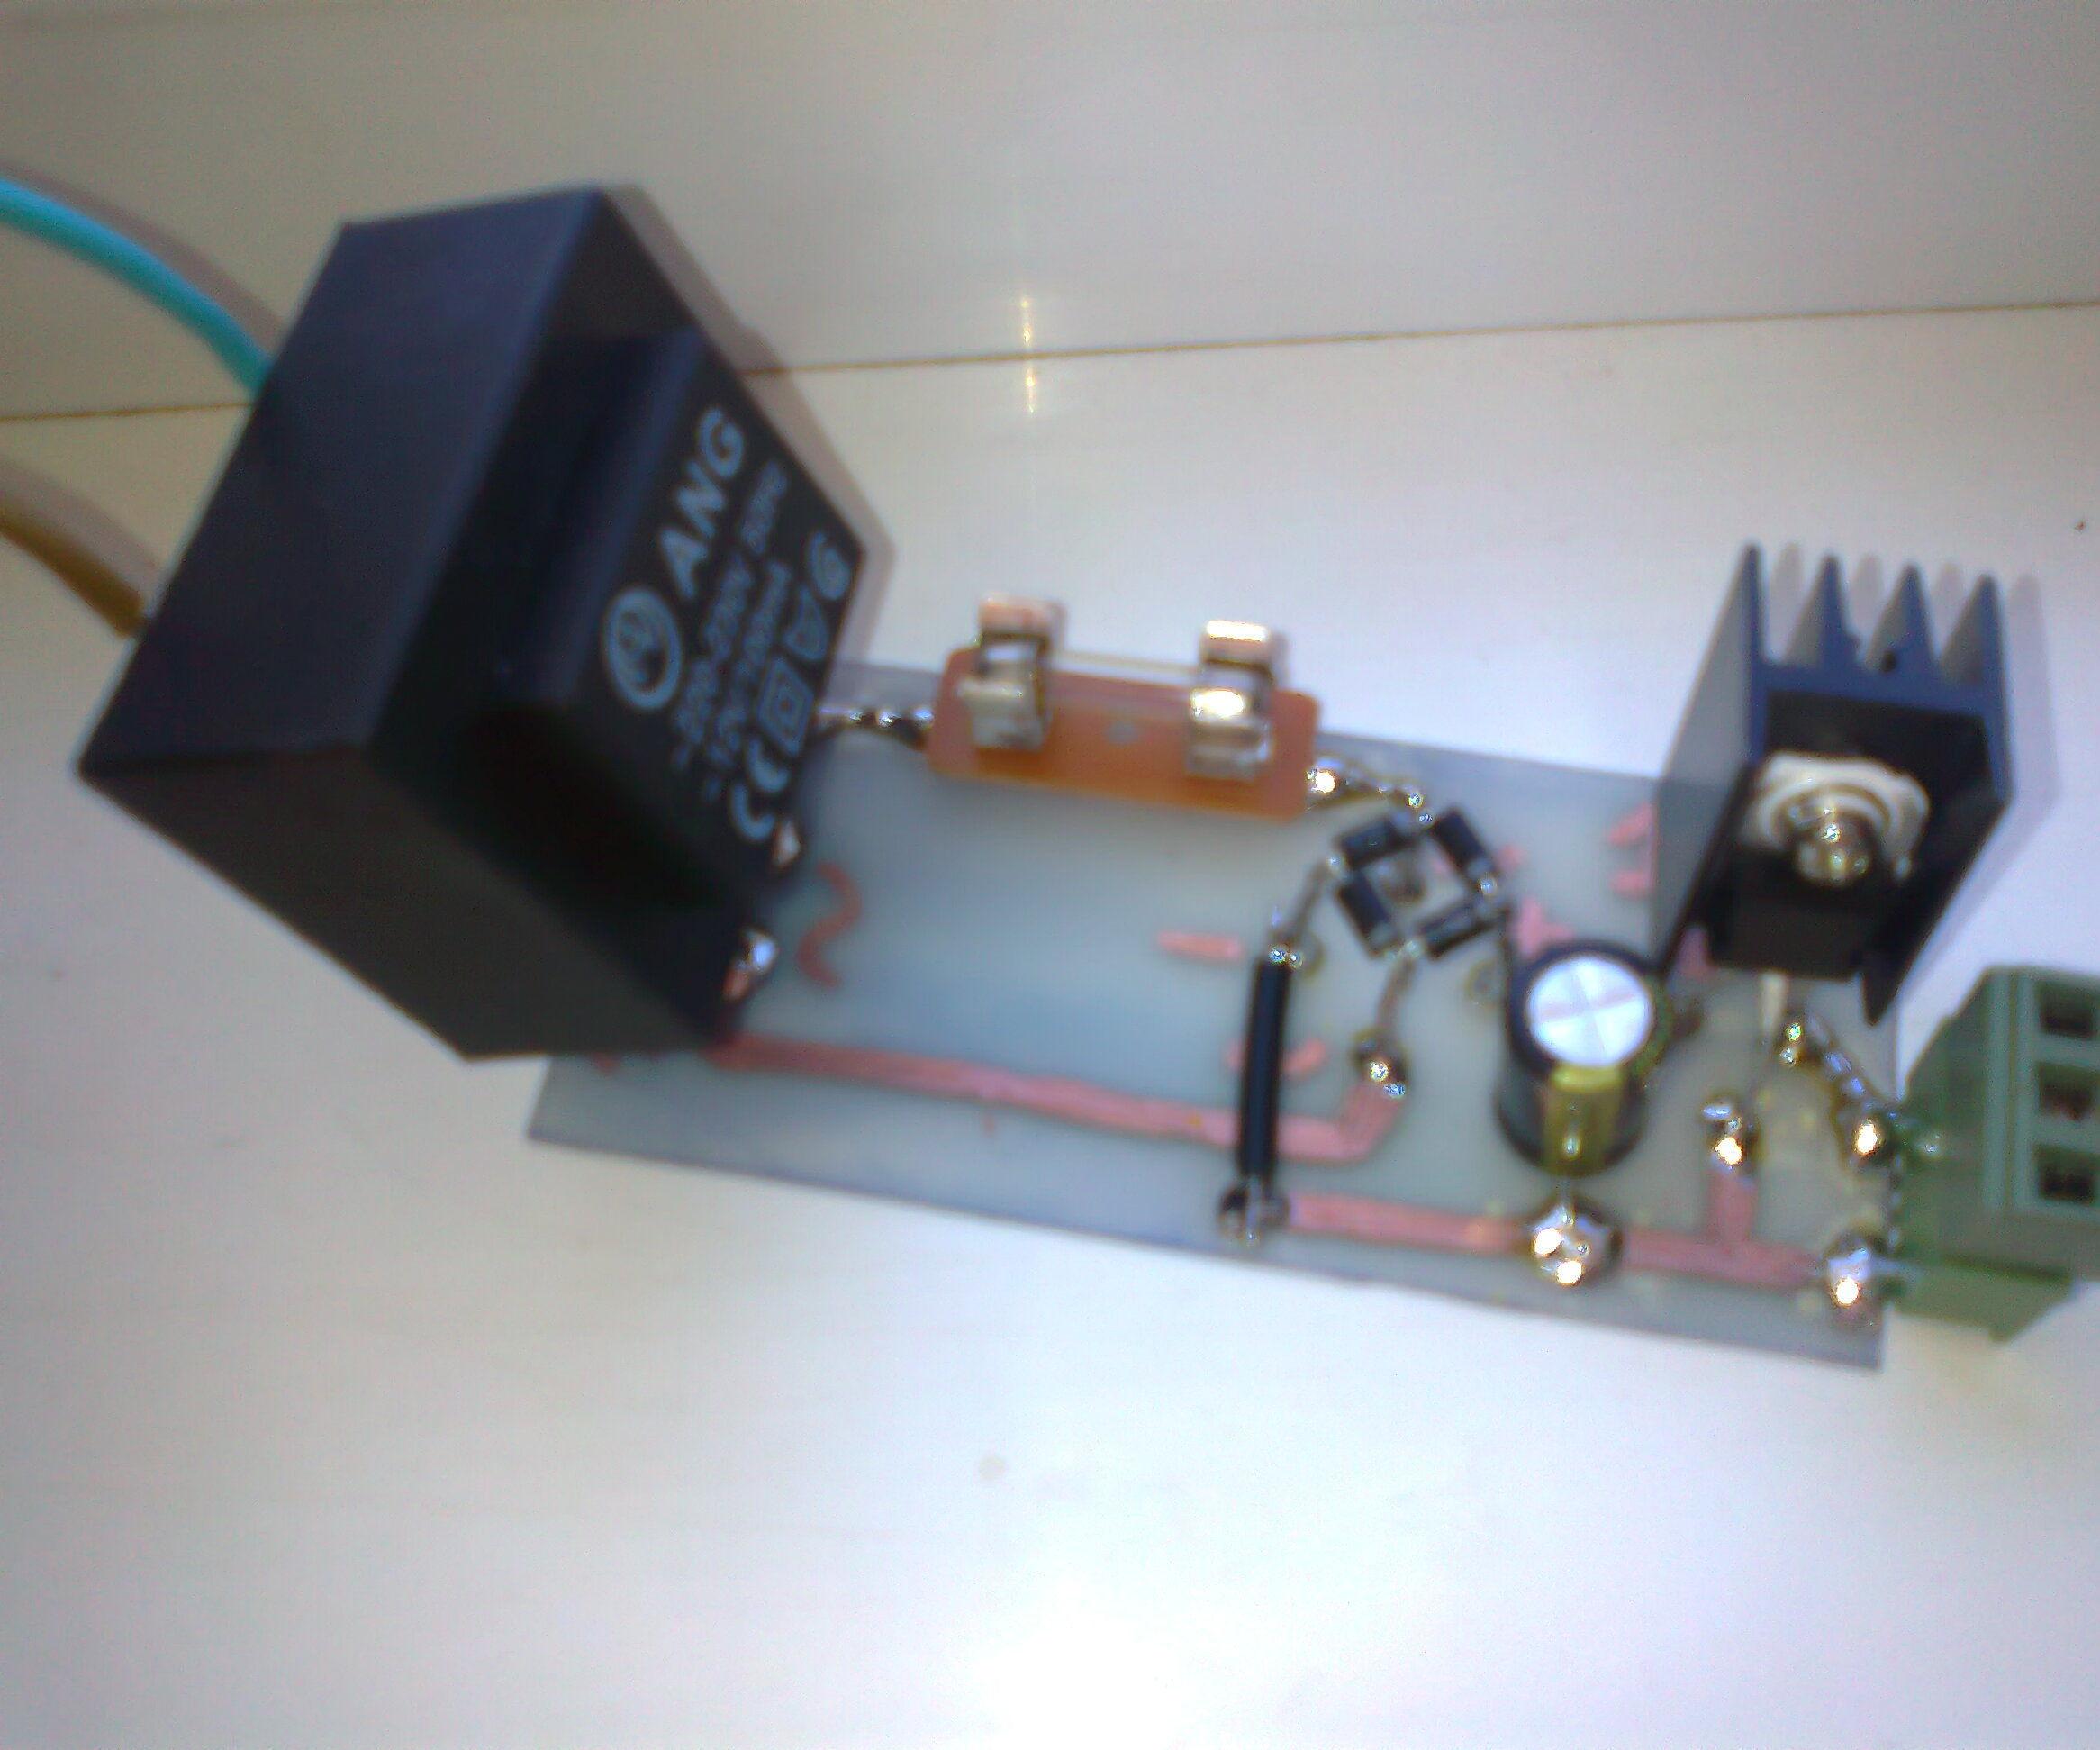 ~12VAC to 12VDC converter circuit